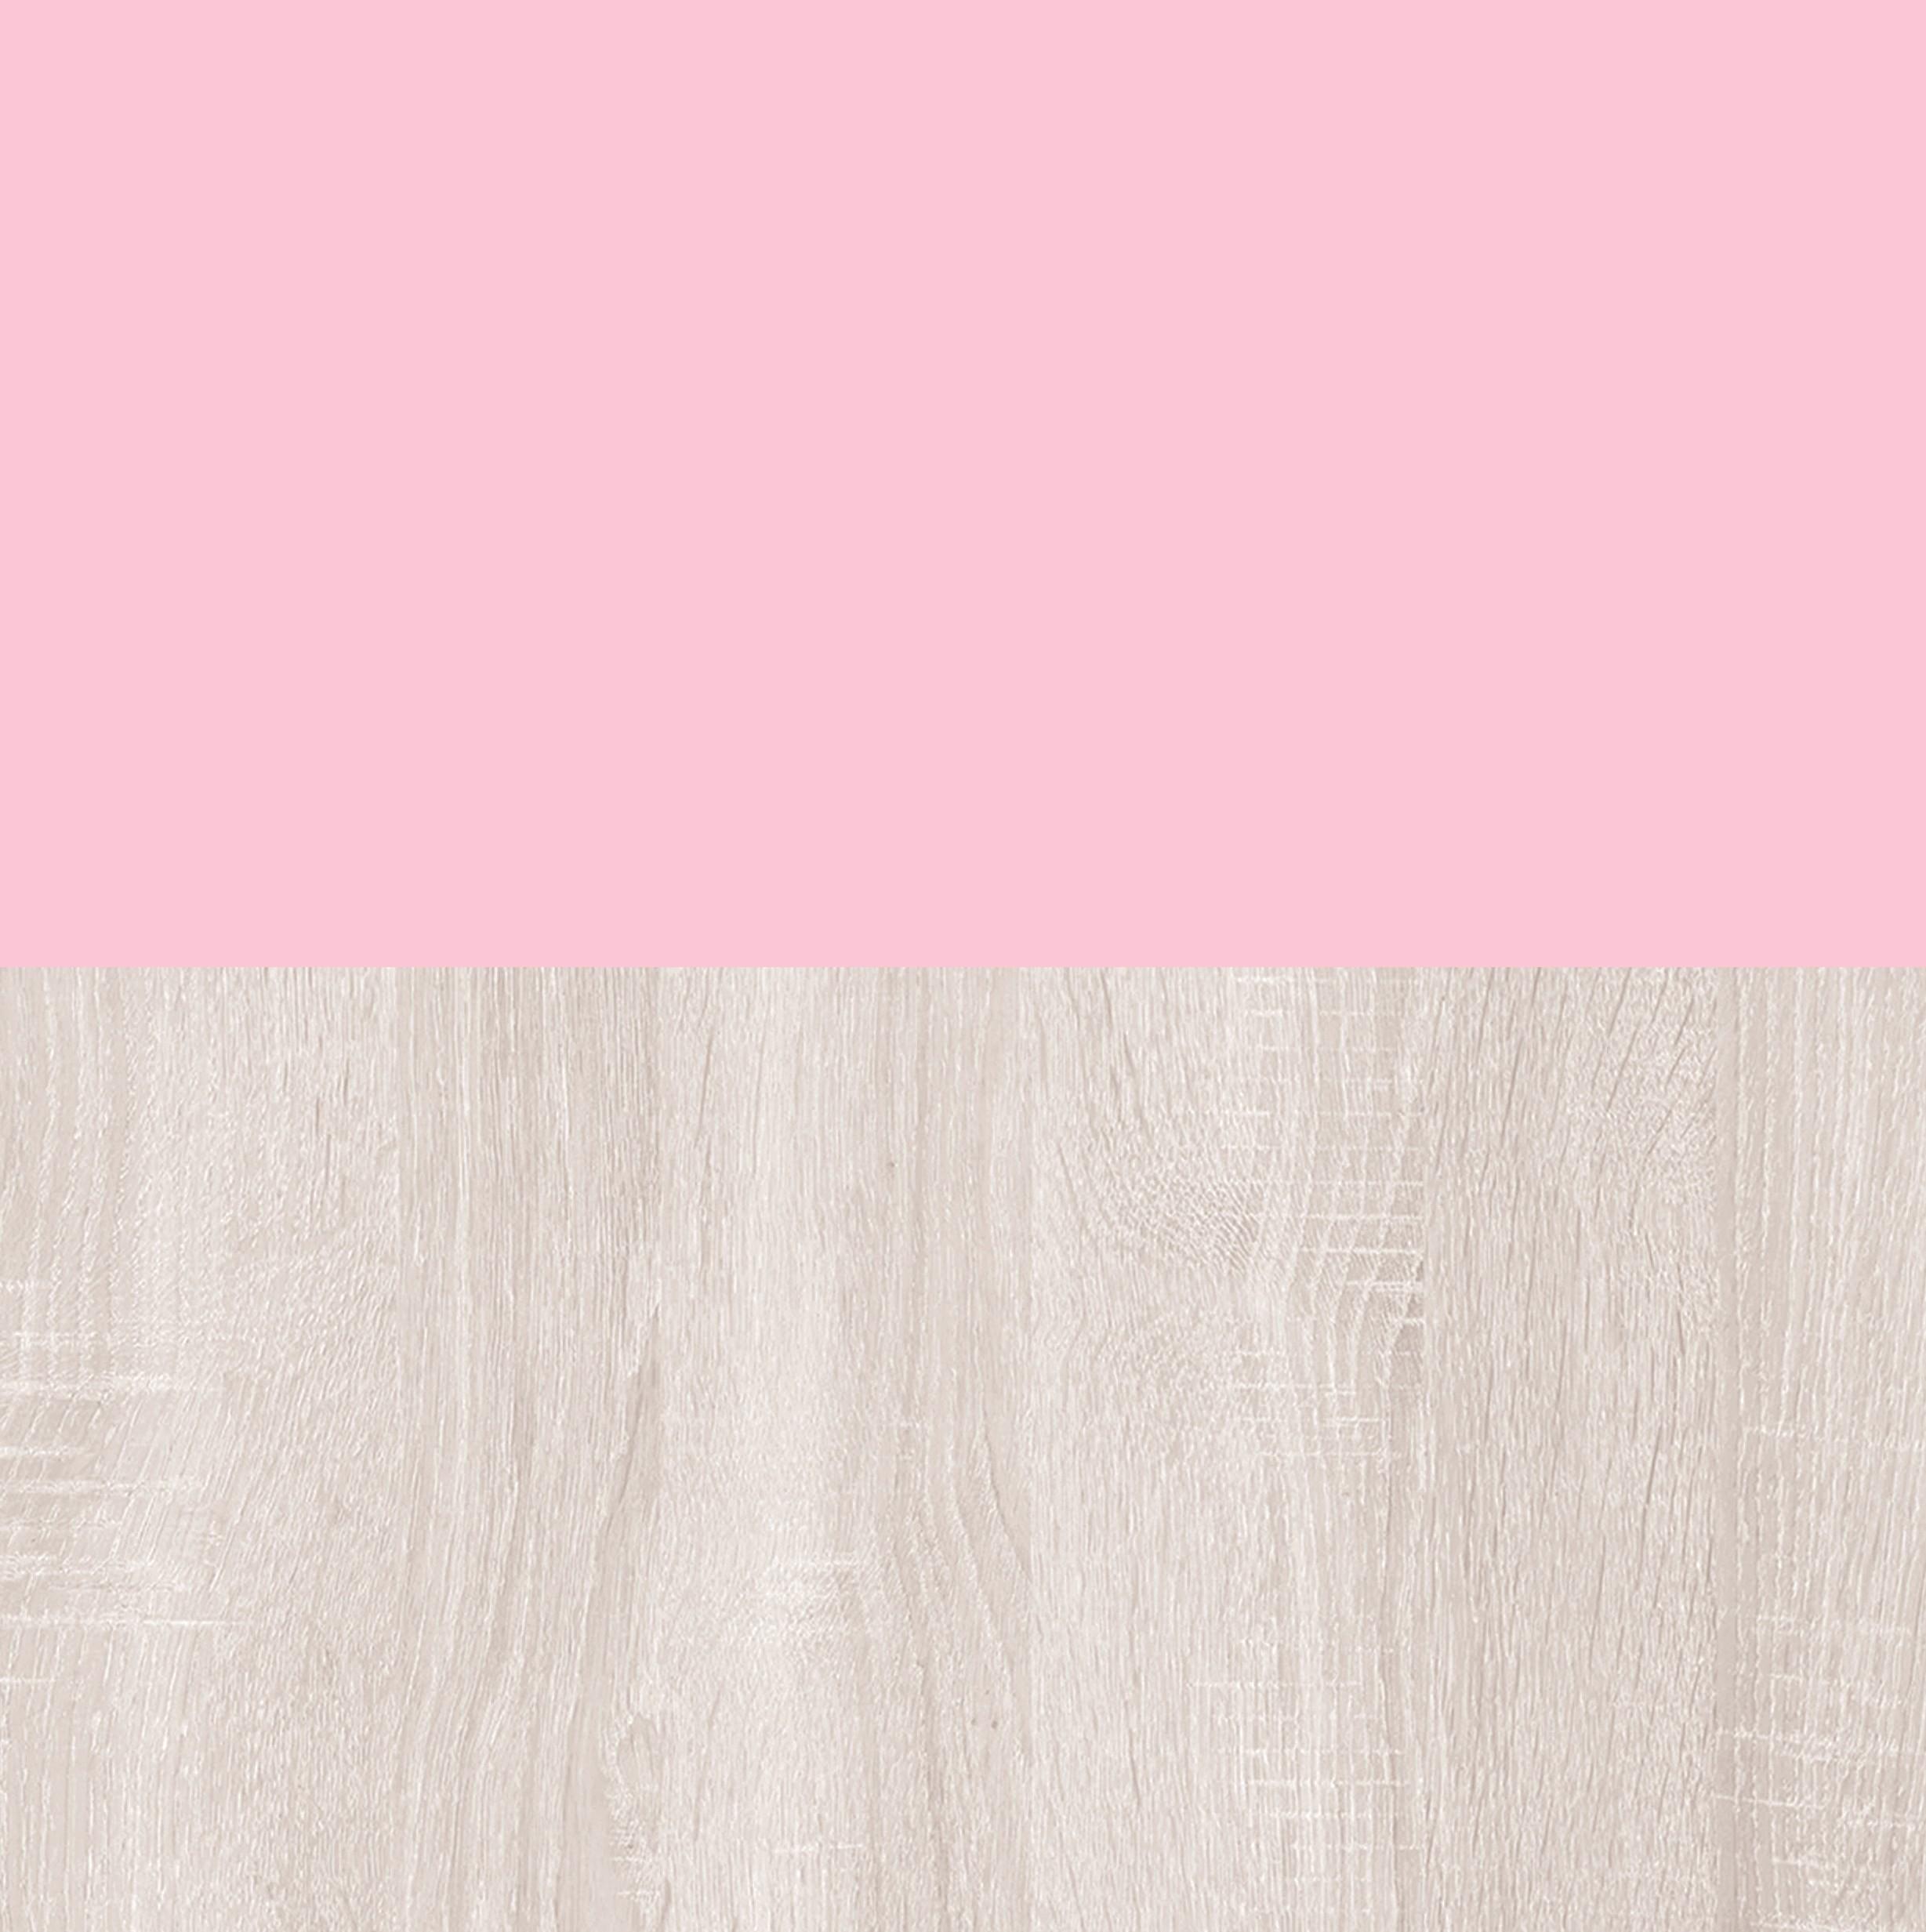 Hibernian y rosa